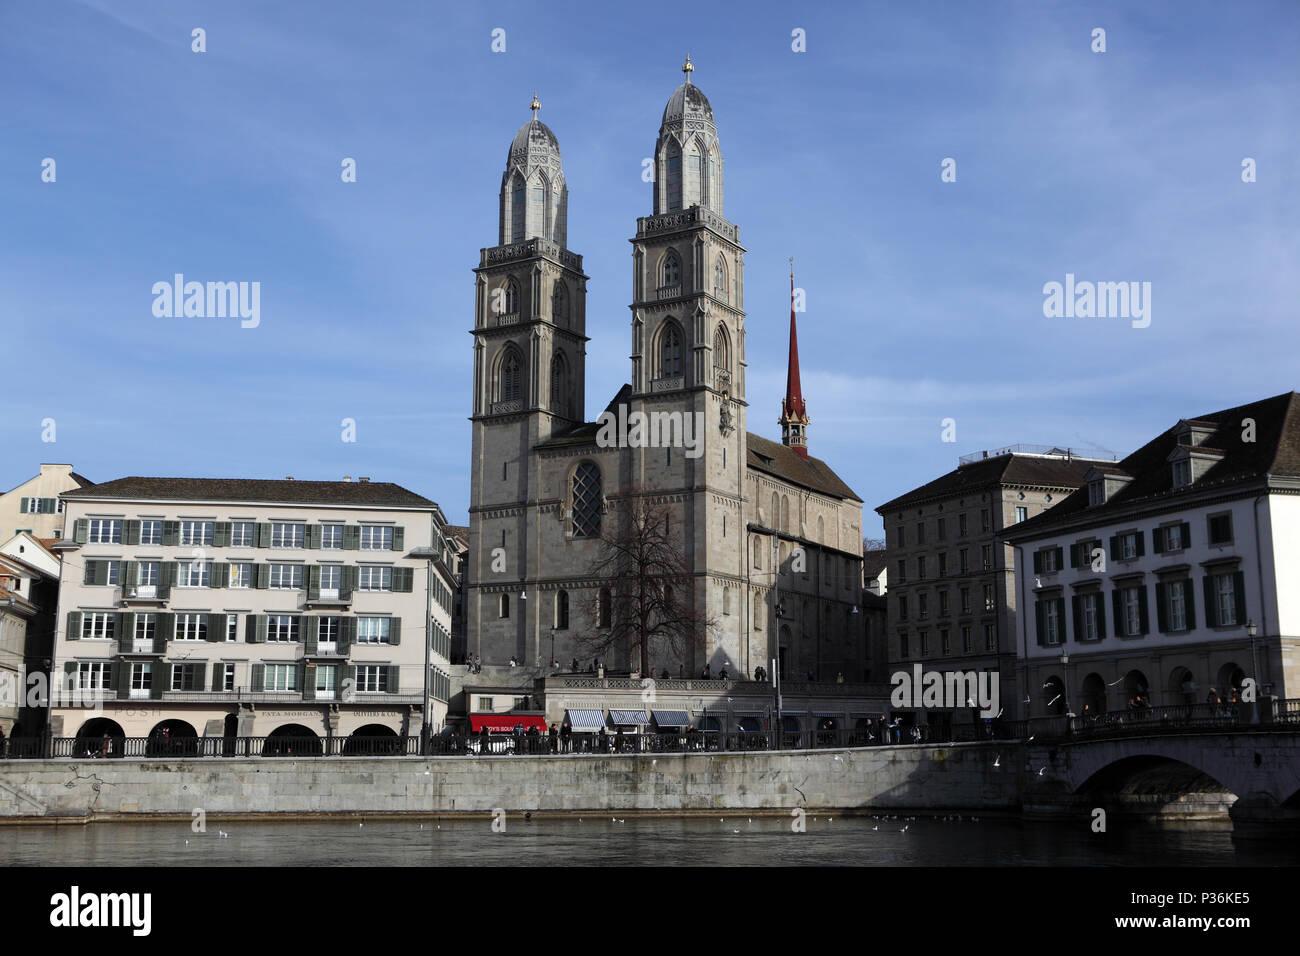 Zurich, Switzerland, the Grossmuenster on the Limmatquai - Stock Image